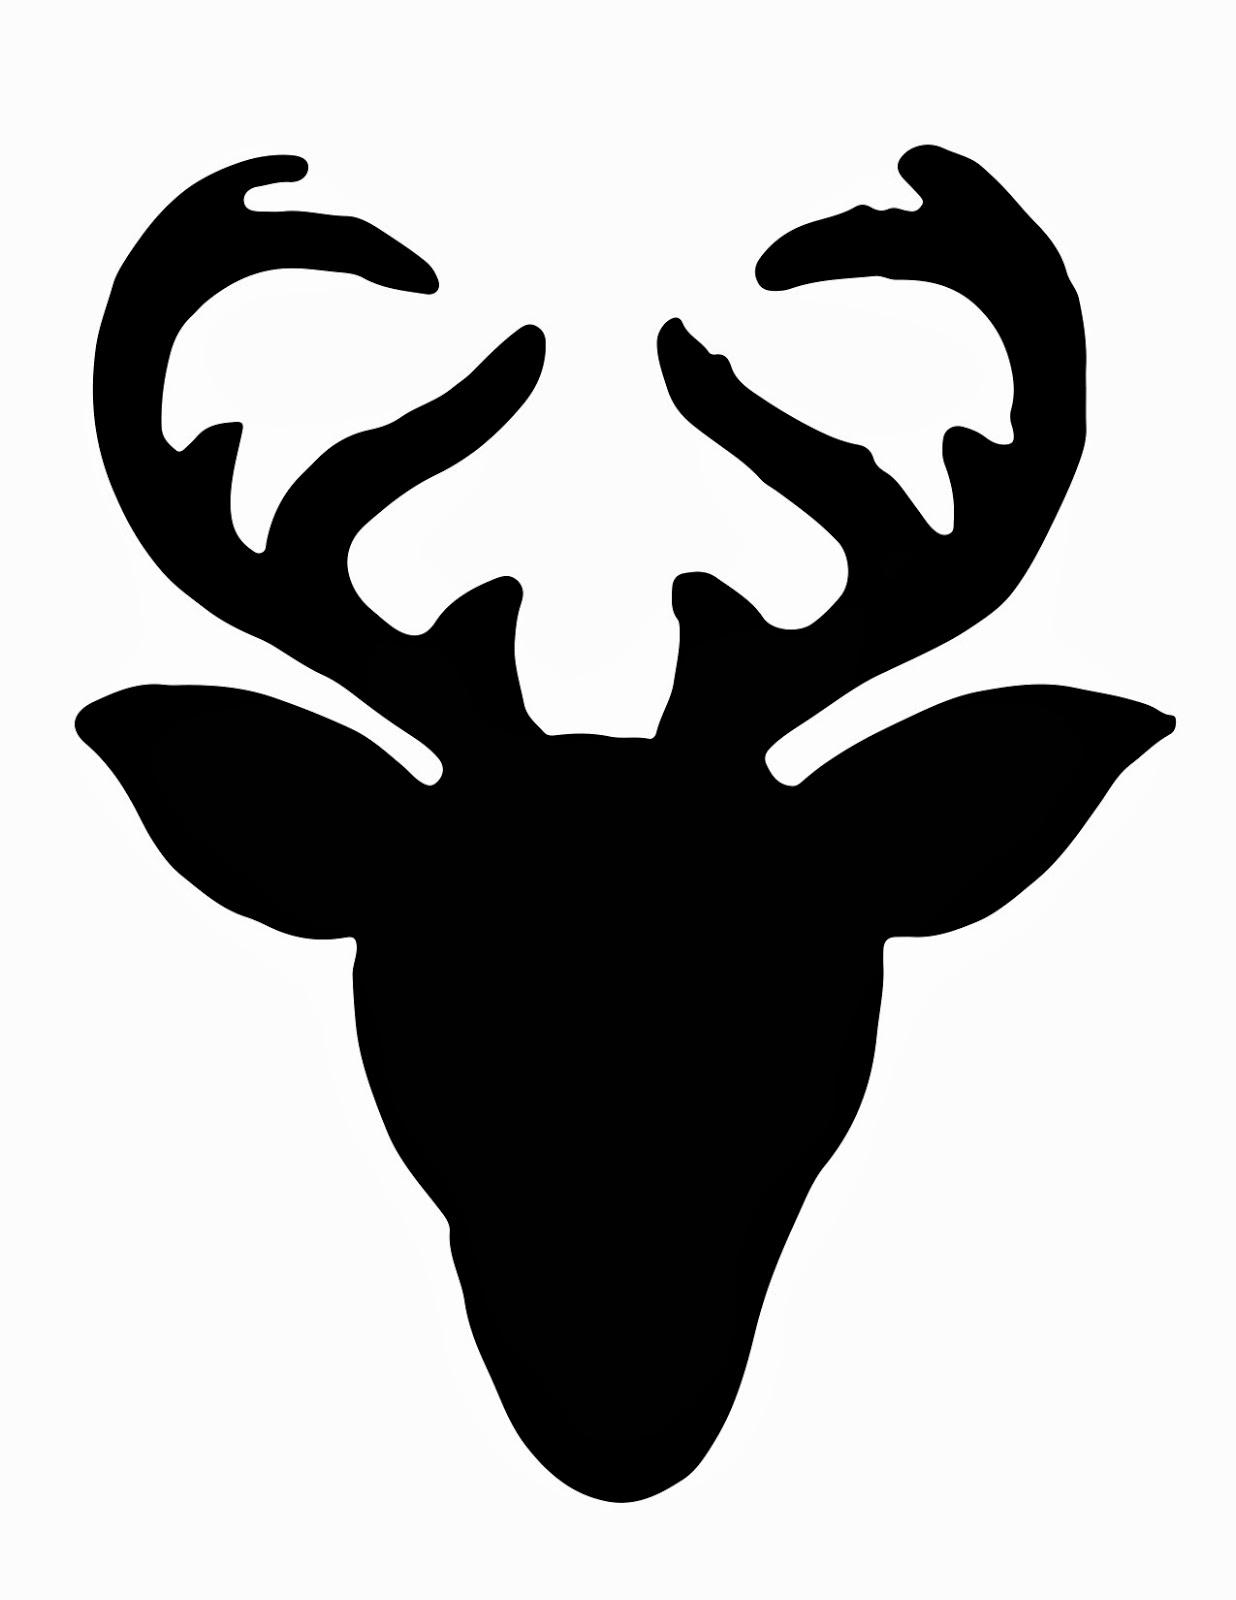 1236x1600 Reindeer Head Outline Clipart